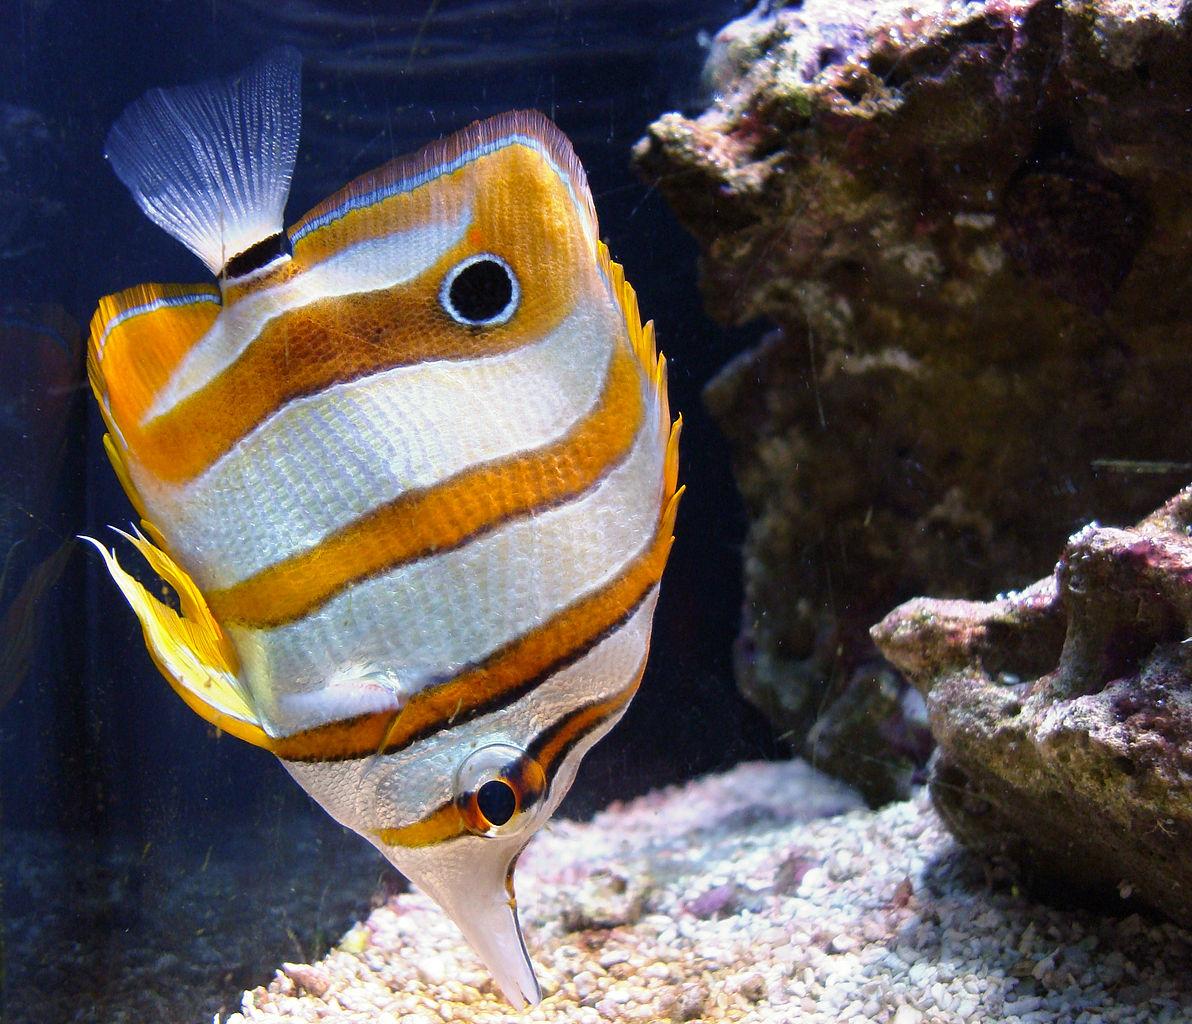 File:Seattle Aquarium, 1.JPG - Wikipedia